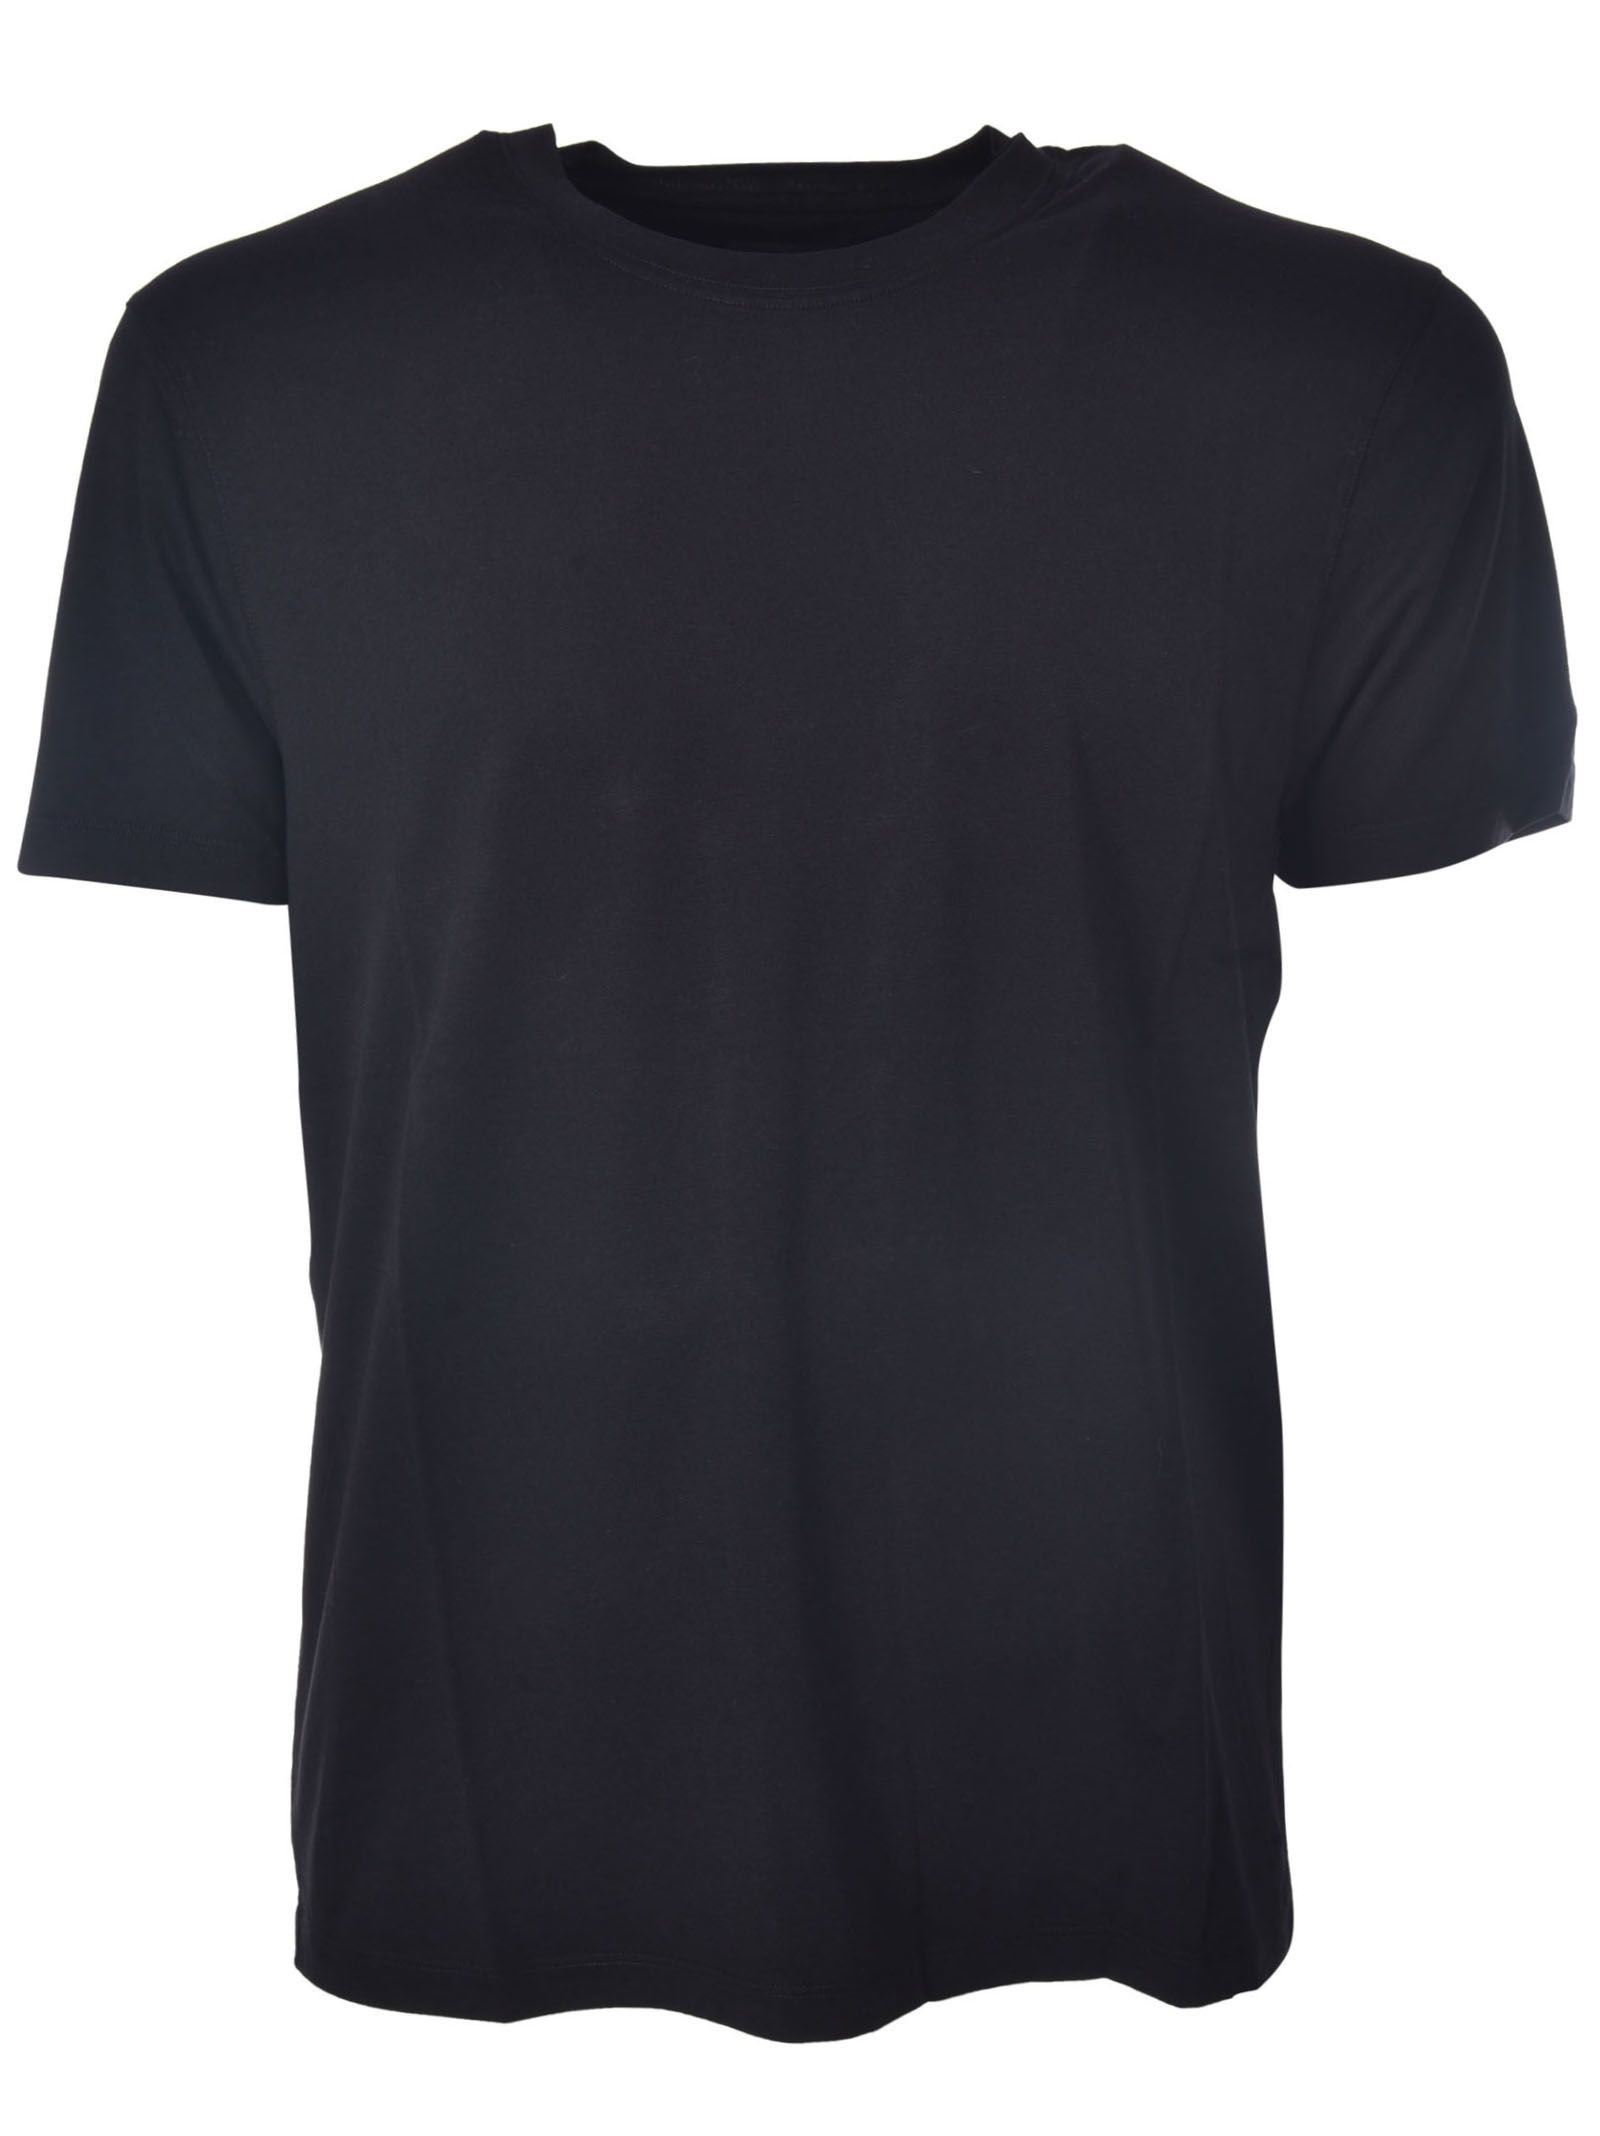 Tom Ford Classic T-Shirt